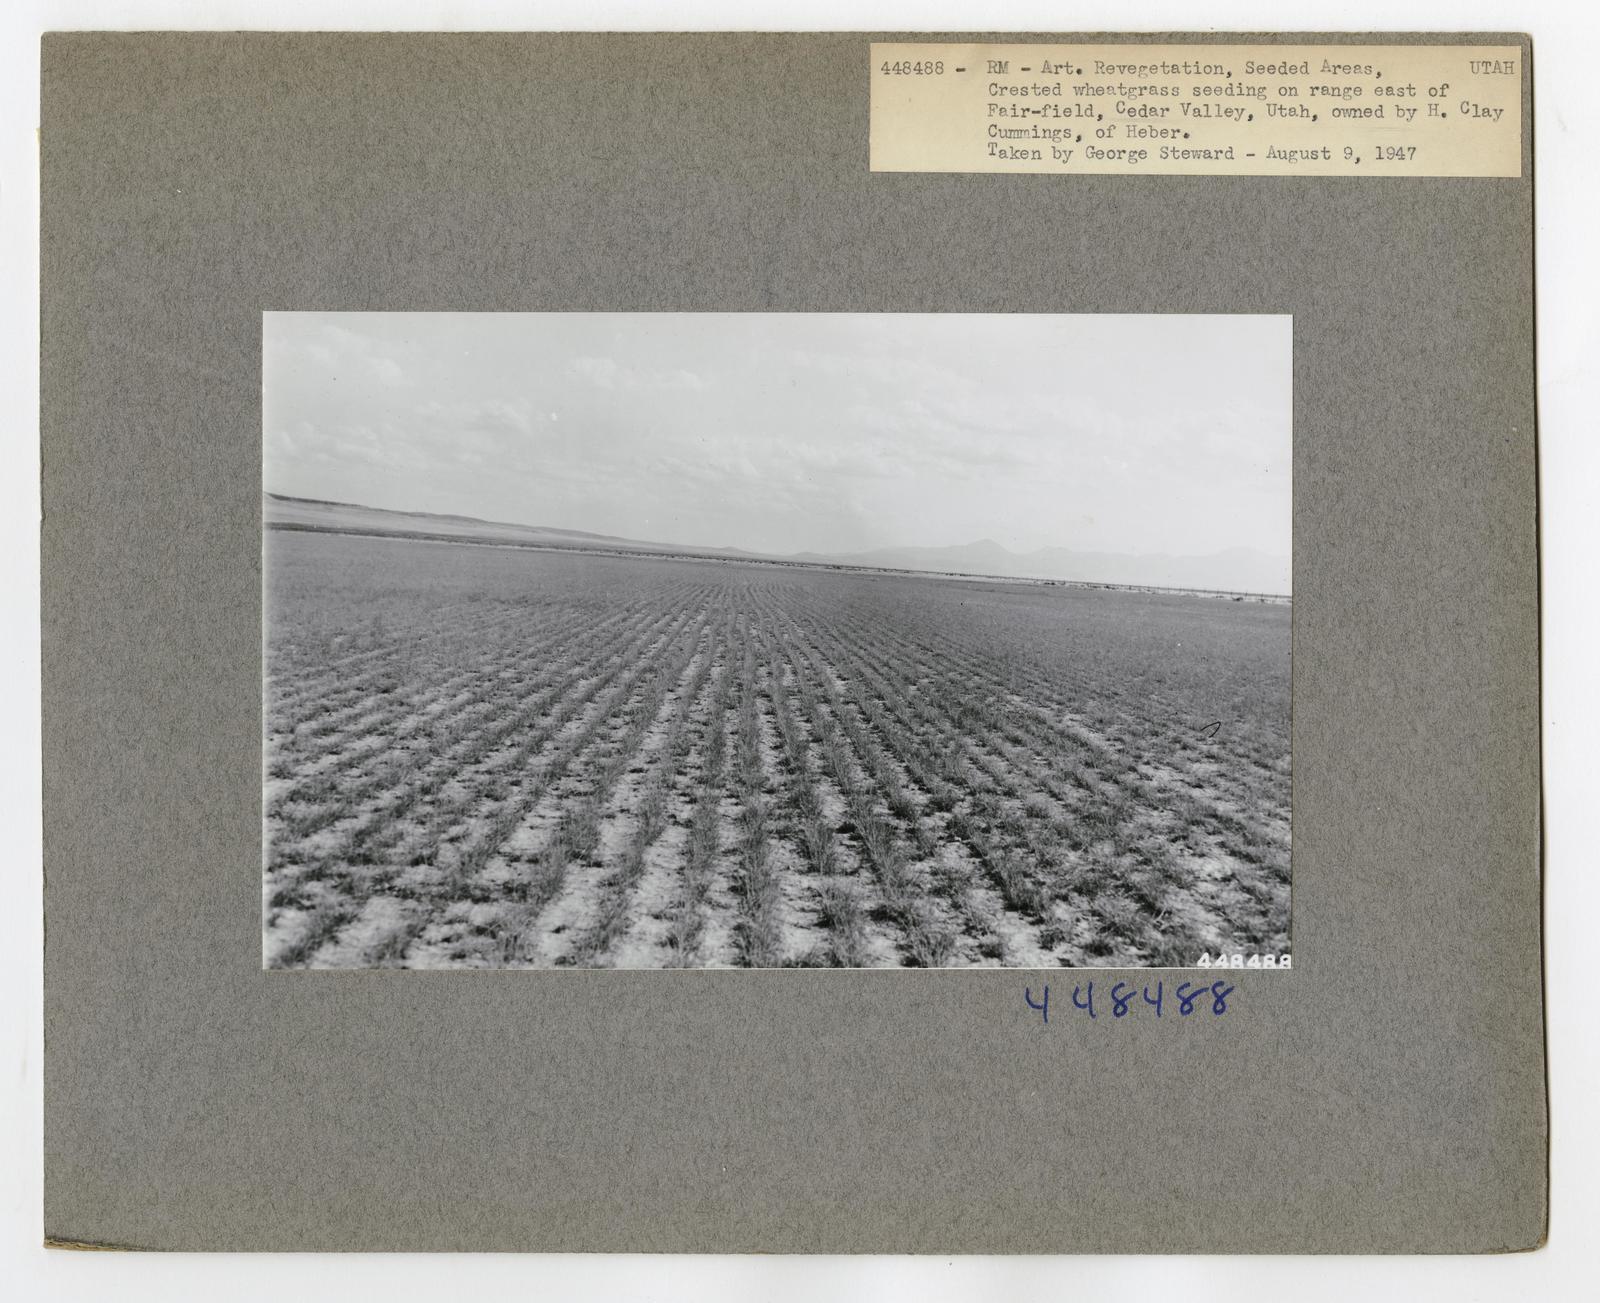 Range Revegetation - Plant Control - Utah